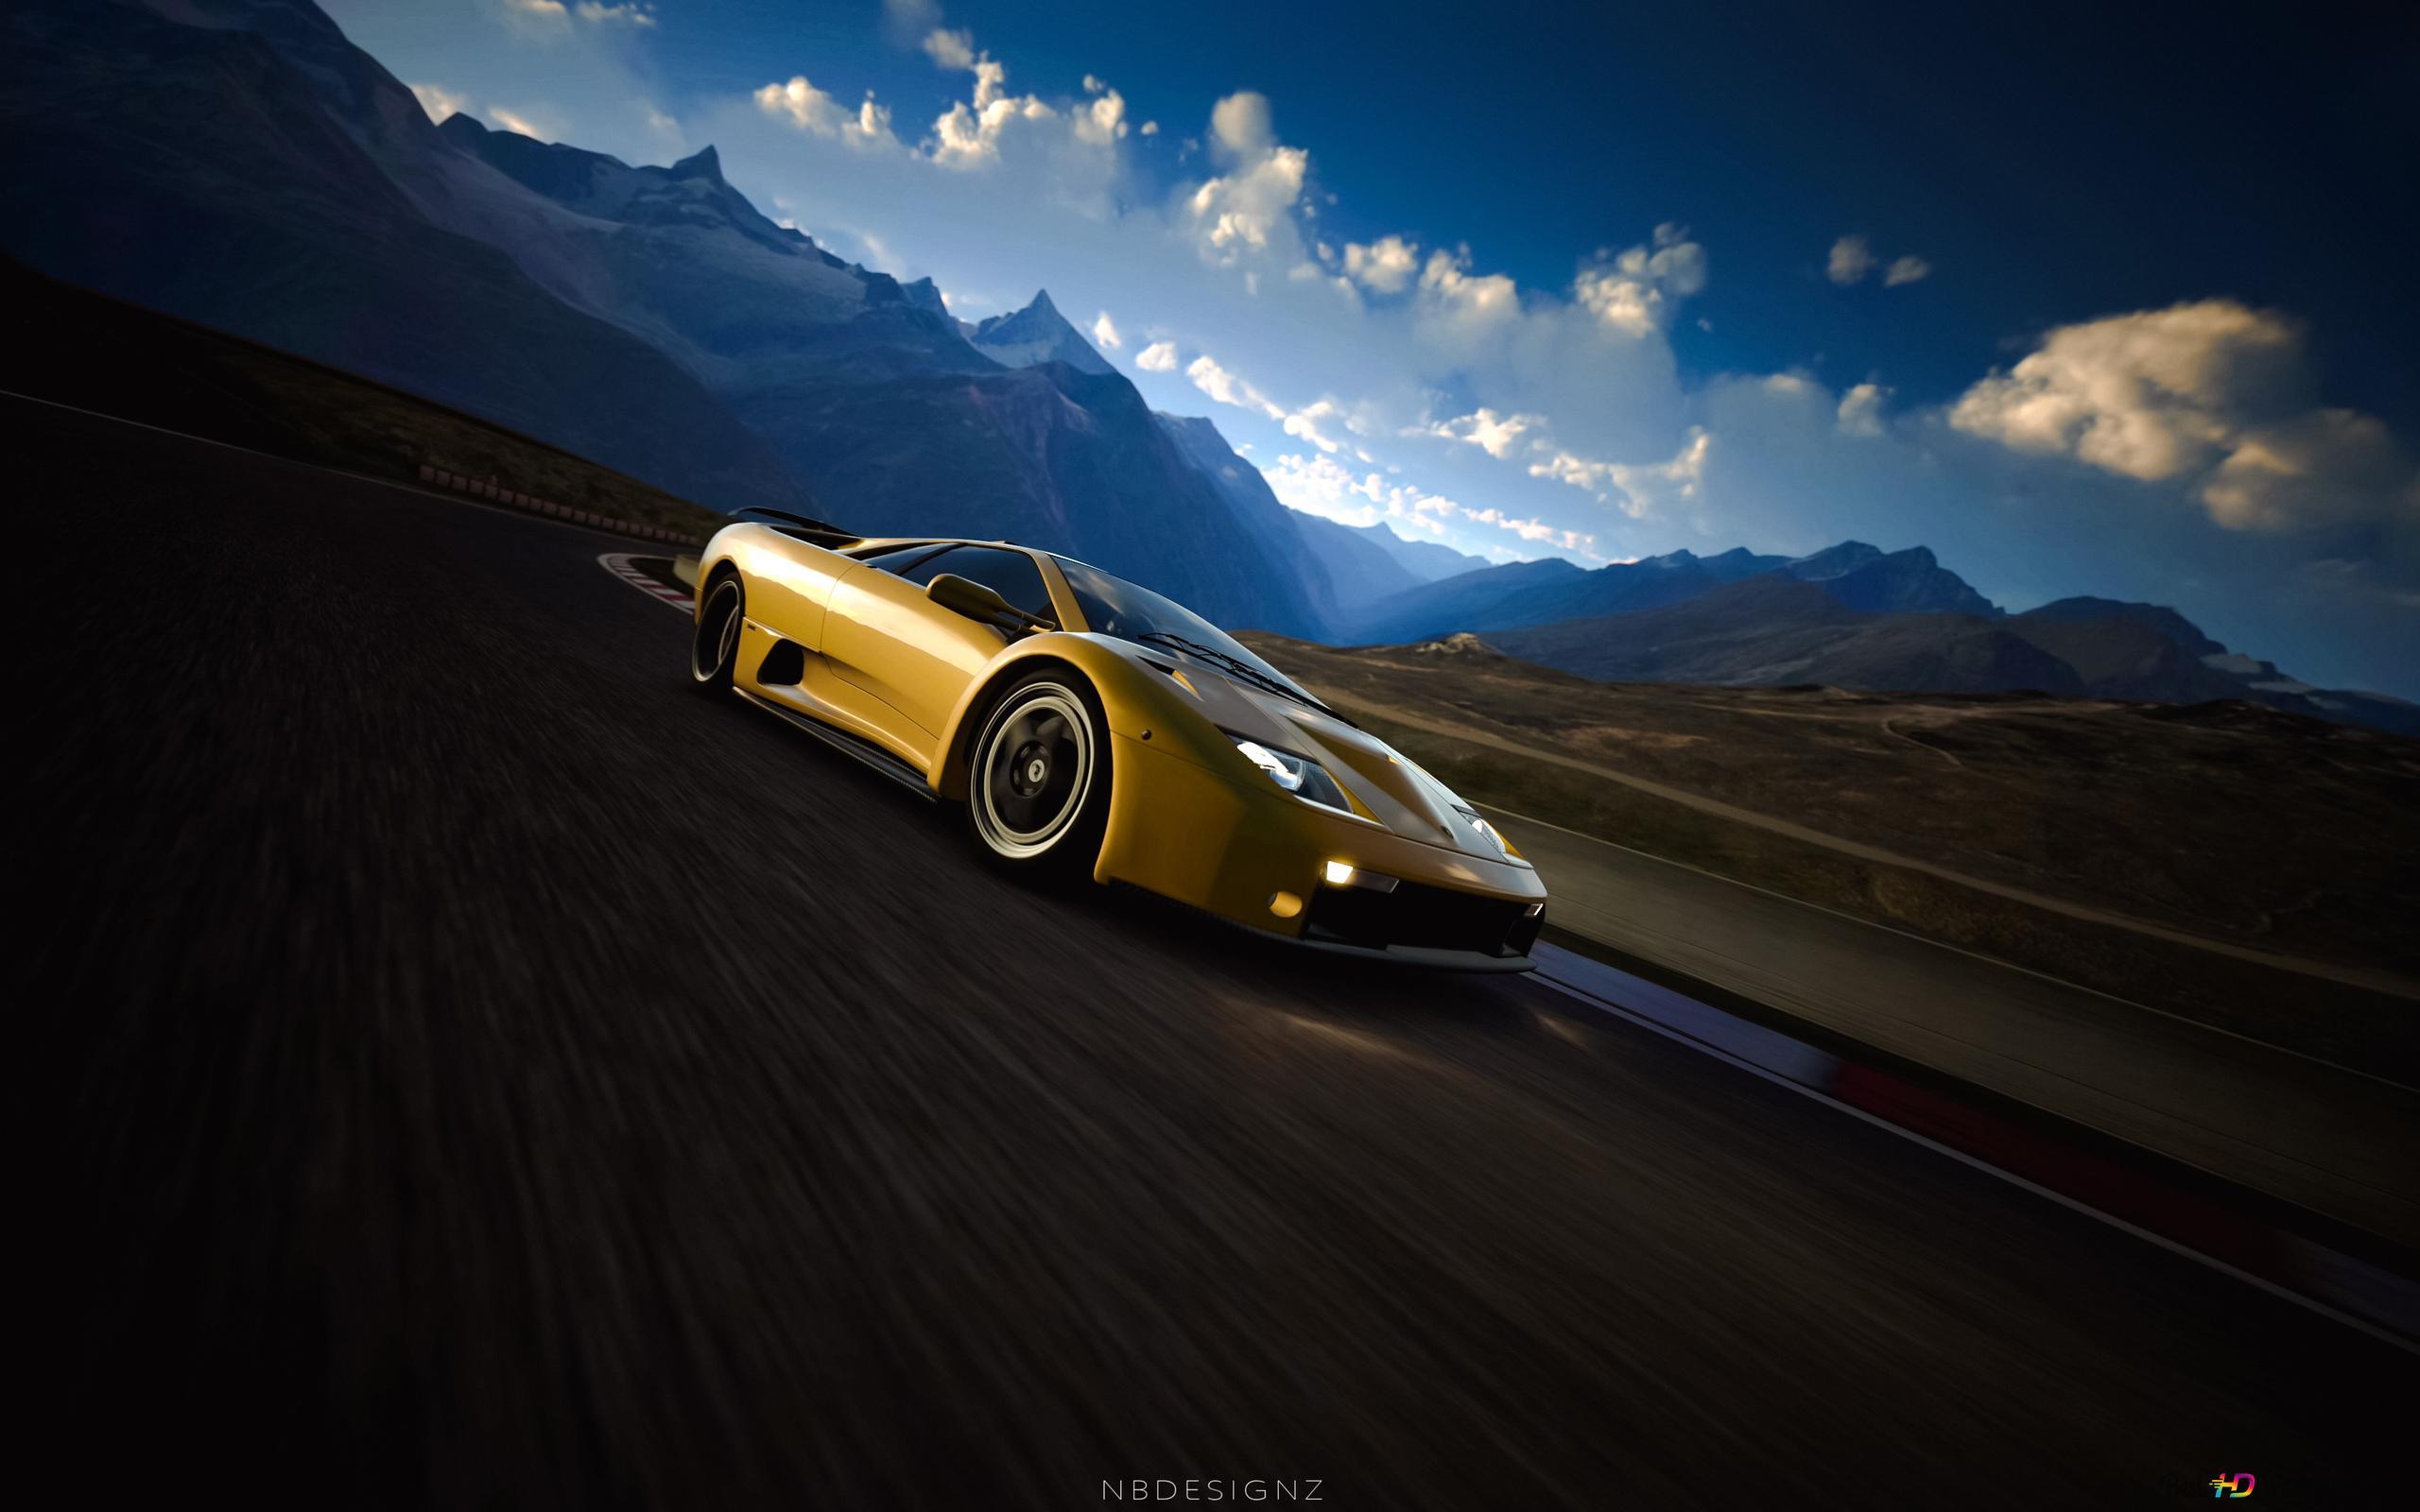 Descargar Fondo De Pantalla Lamborghini Diablo Amarillo Hd